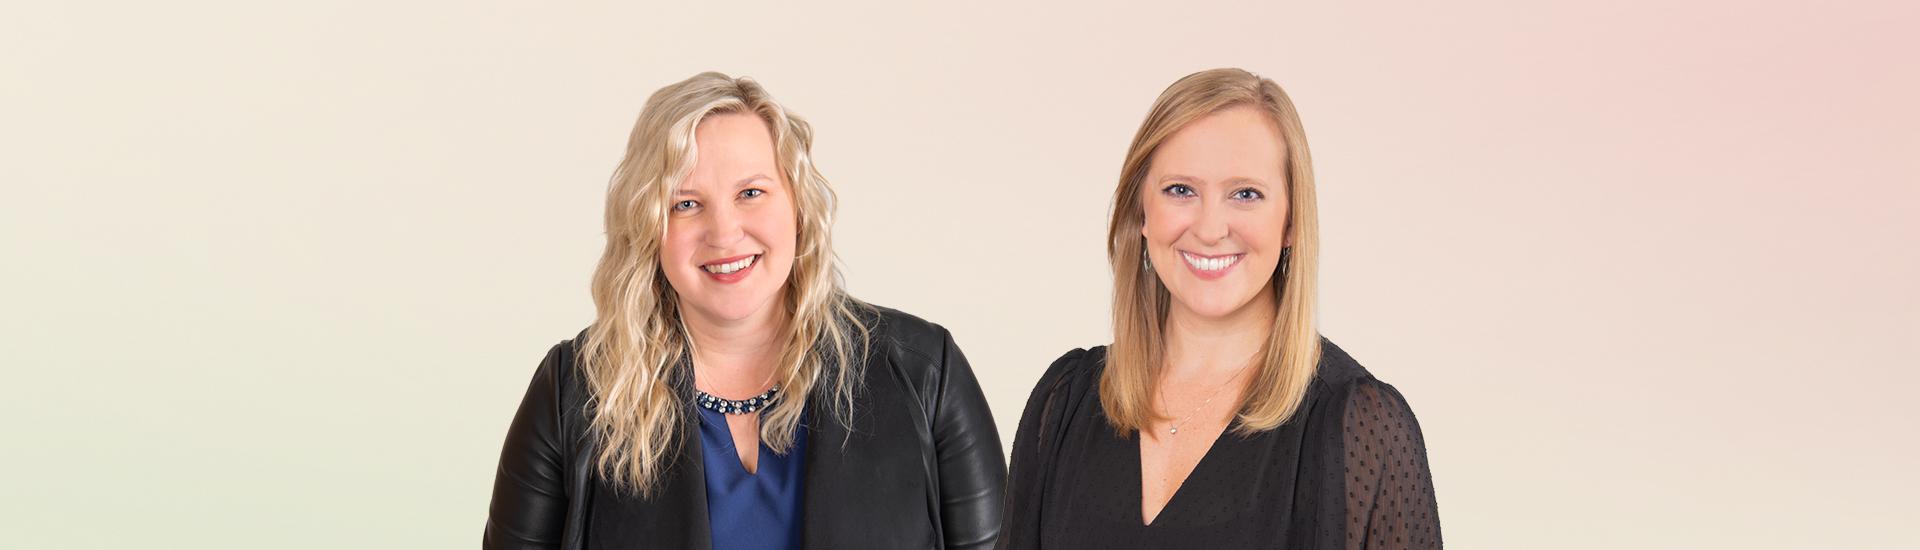 Vye Expands Account Team with Sara Brennan and Sarah Cords